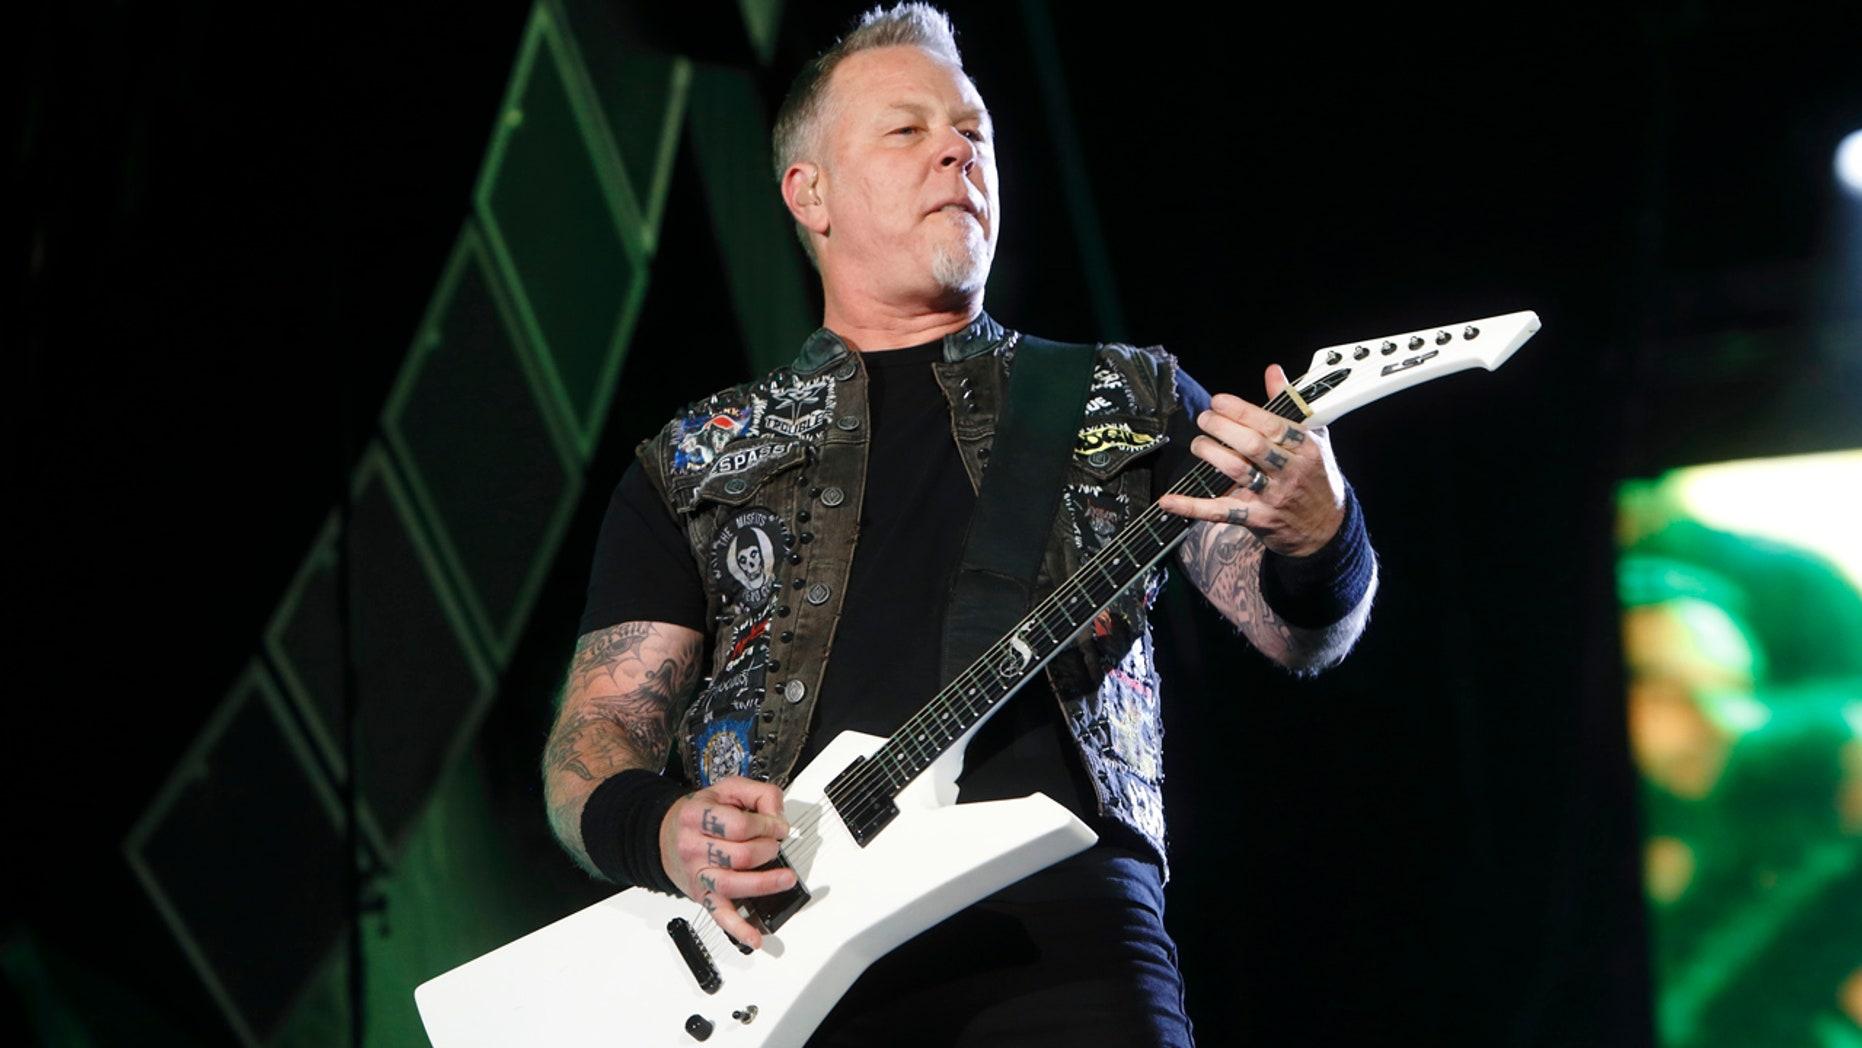 May 9, 2015: James Hetfield of Metallica performs at Rock in Rio USA in Las Vegas.